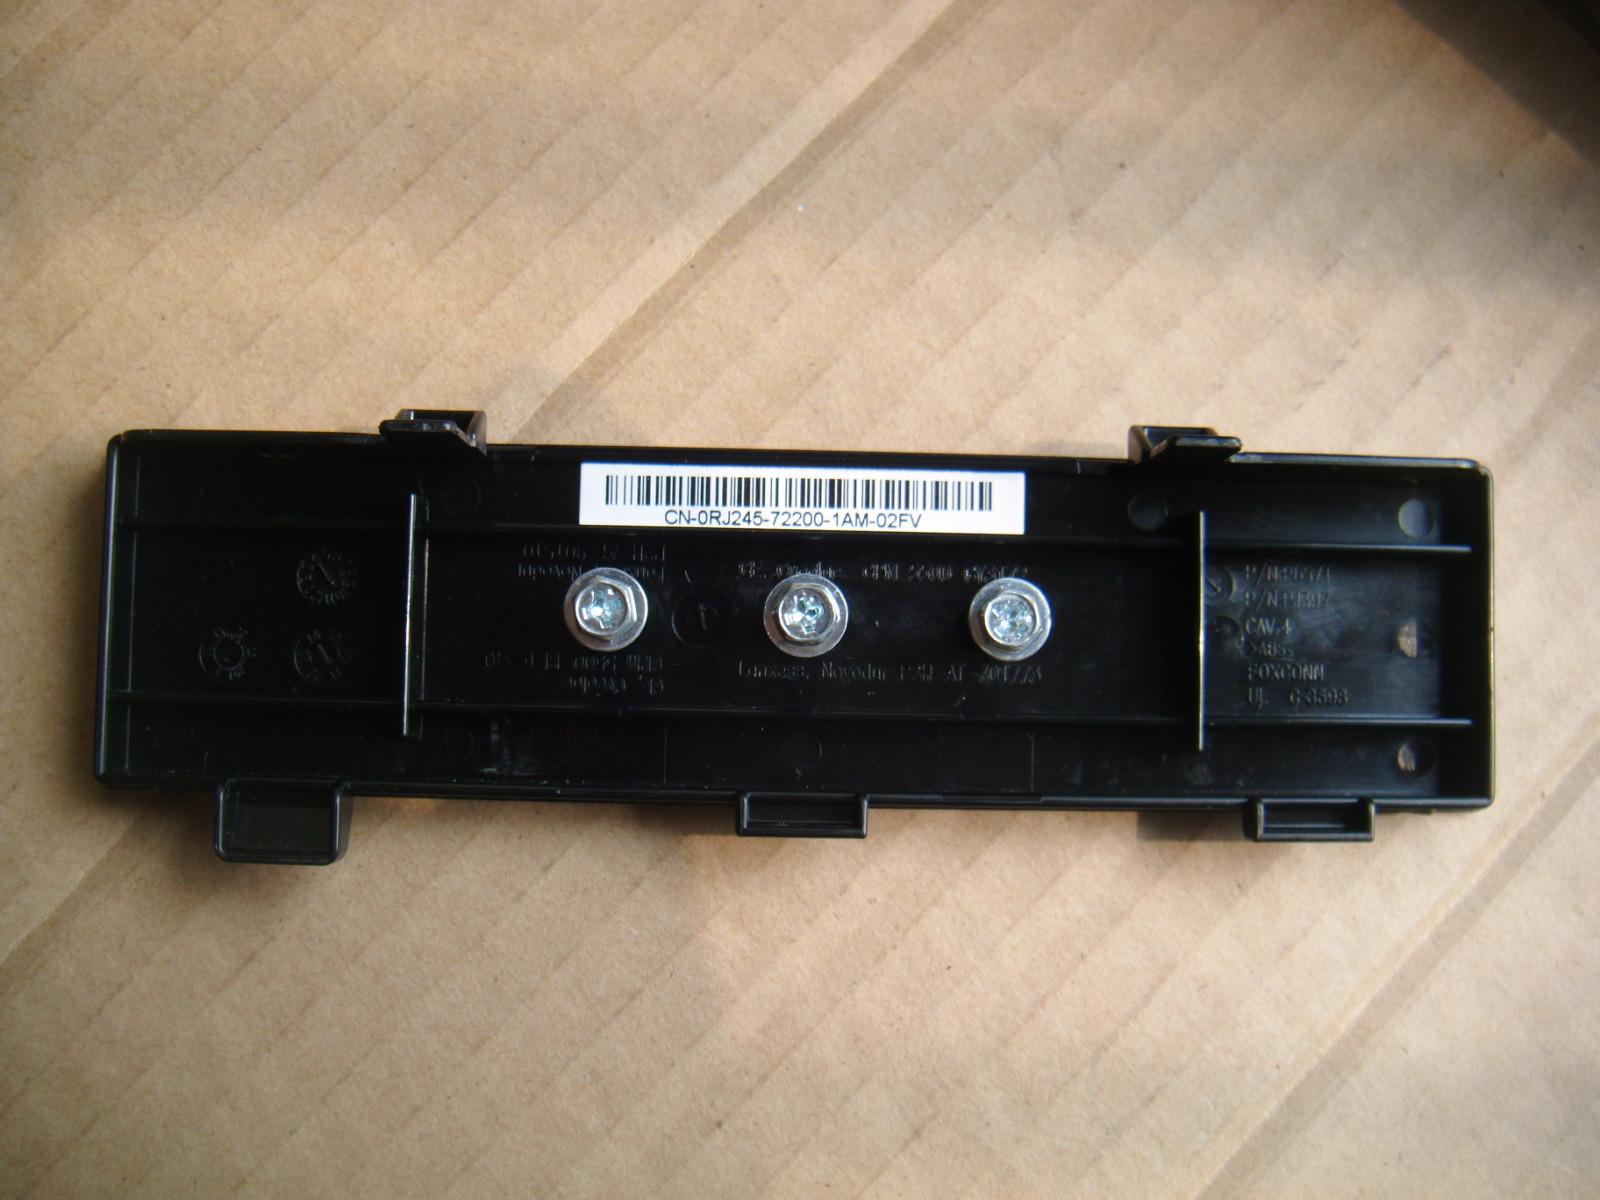 New Dell Optical Drive Blank Filler RJ245 P6571 PJ397 GX520 620 745 755 360 380